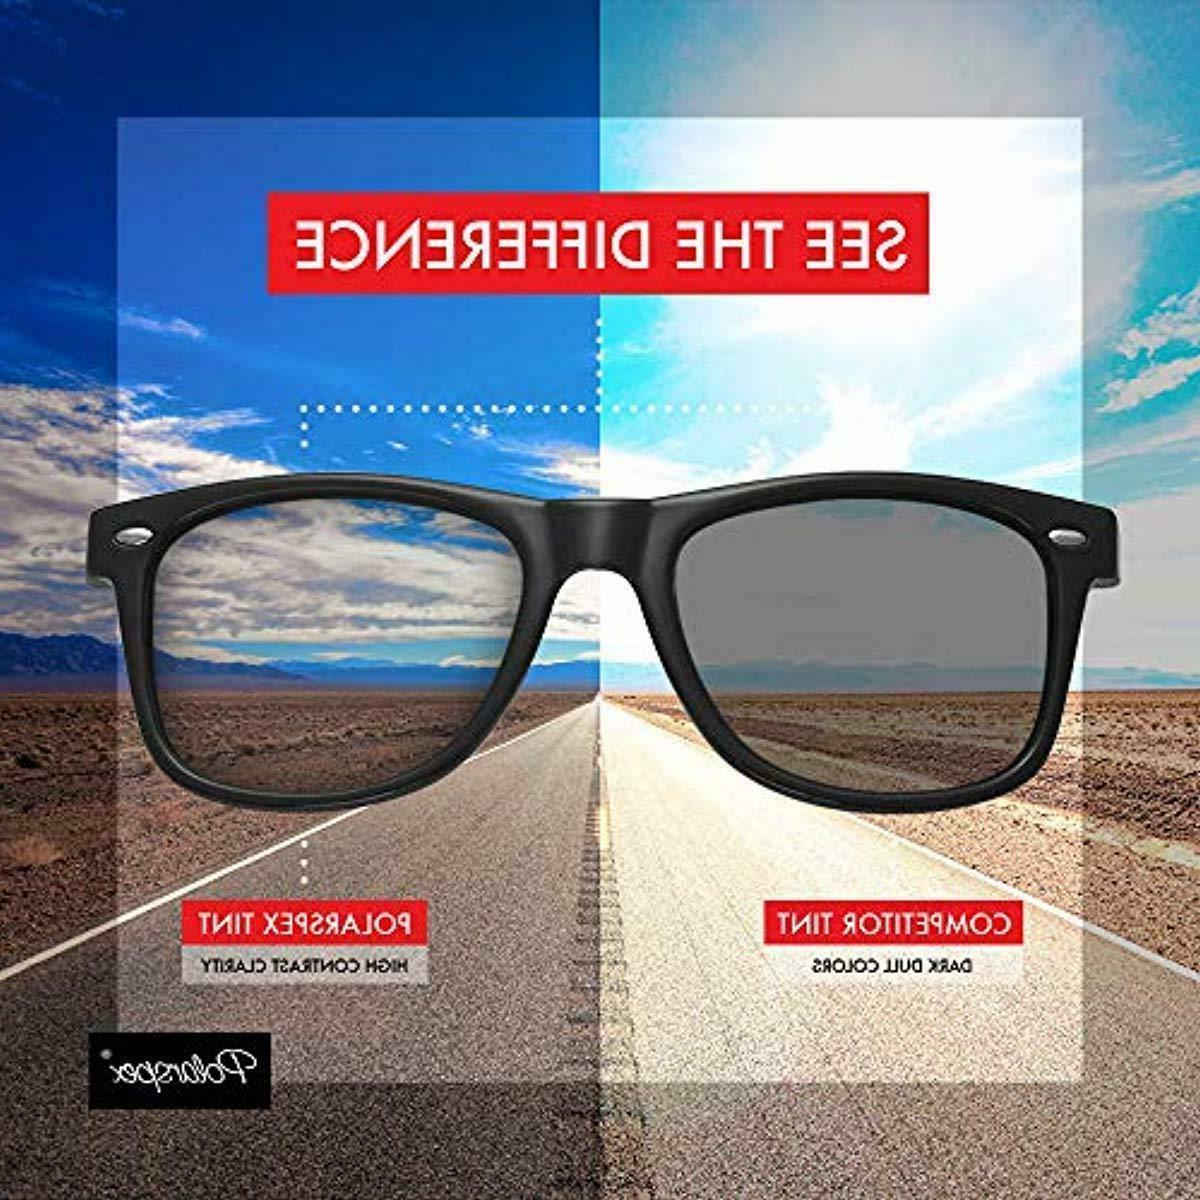 Retro Stylish Sunglasses Polarspex for